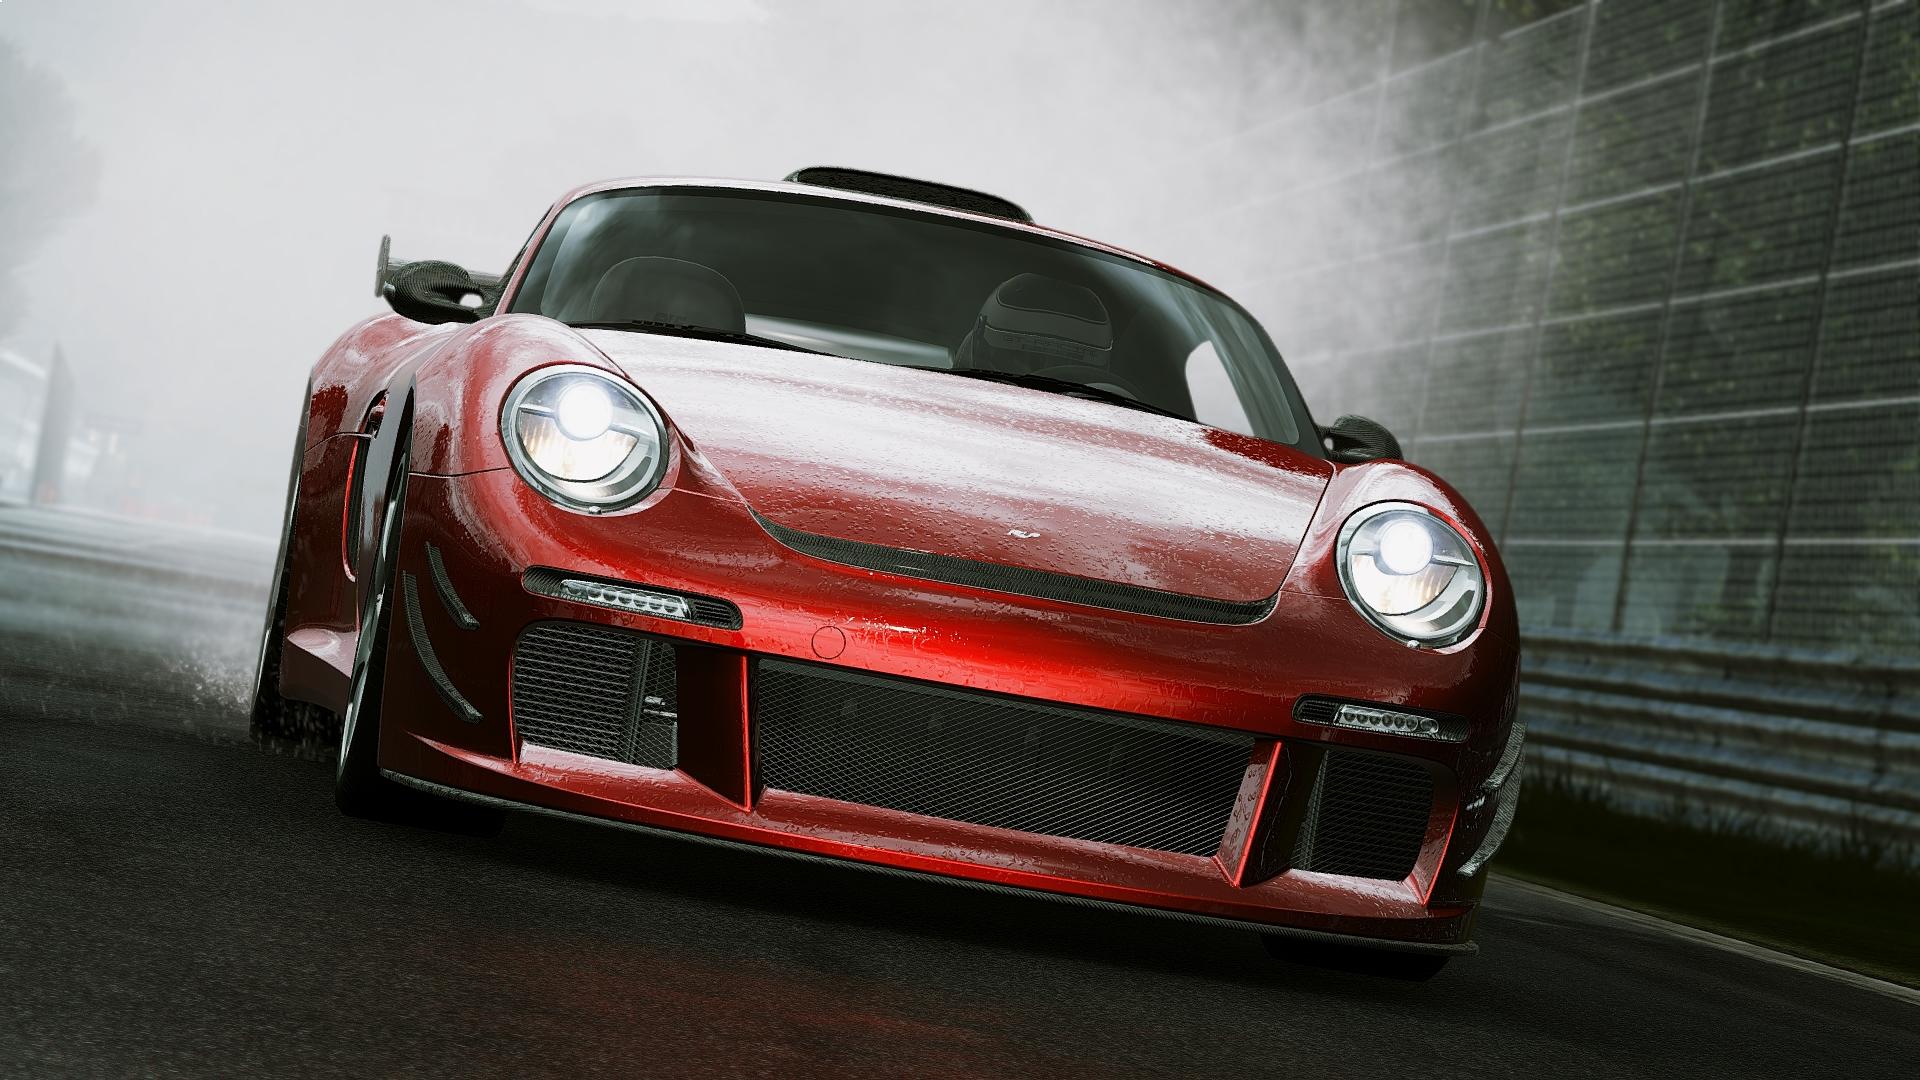 Ctr crash team racing free download pc.